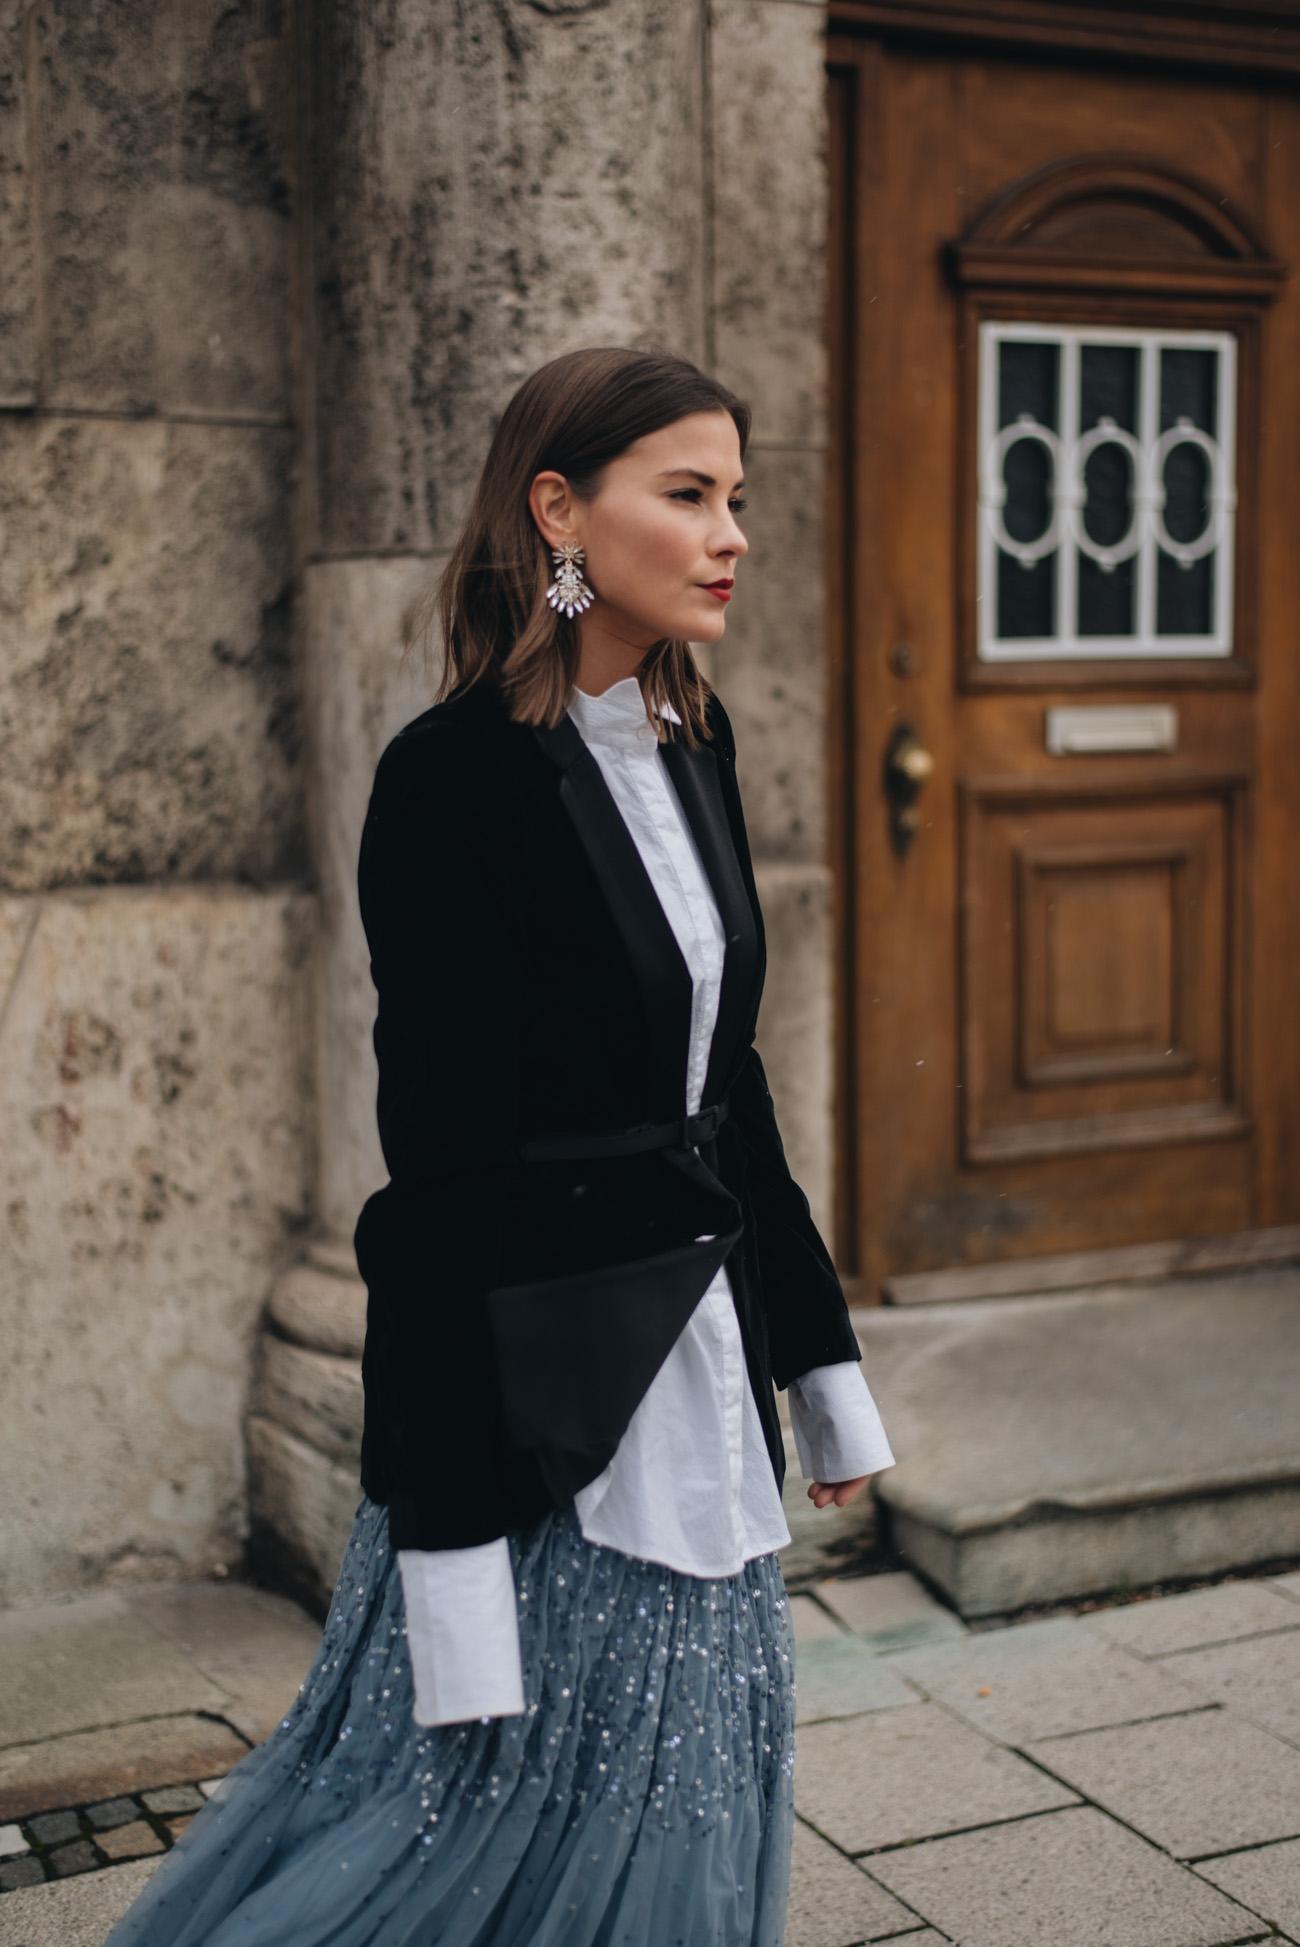 silvester-outfits-inspirationen-Samt-Kleid-schwarz-Party-Look-Glamour-Styling-Tüllrock-Samt-Blazer-Layering-Look-Sock-Boots-Clavi-Cut-nina-schwichtenberg-fashiioncarpet